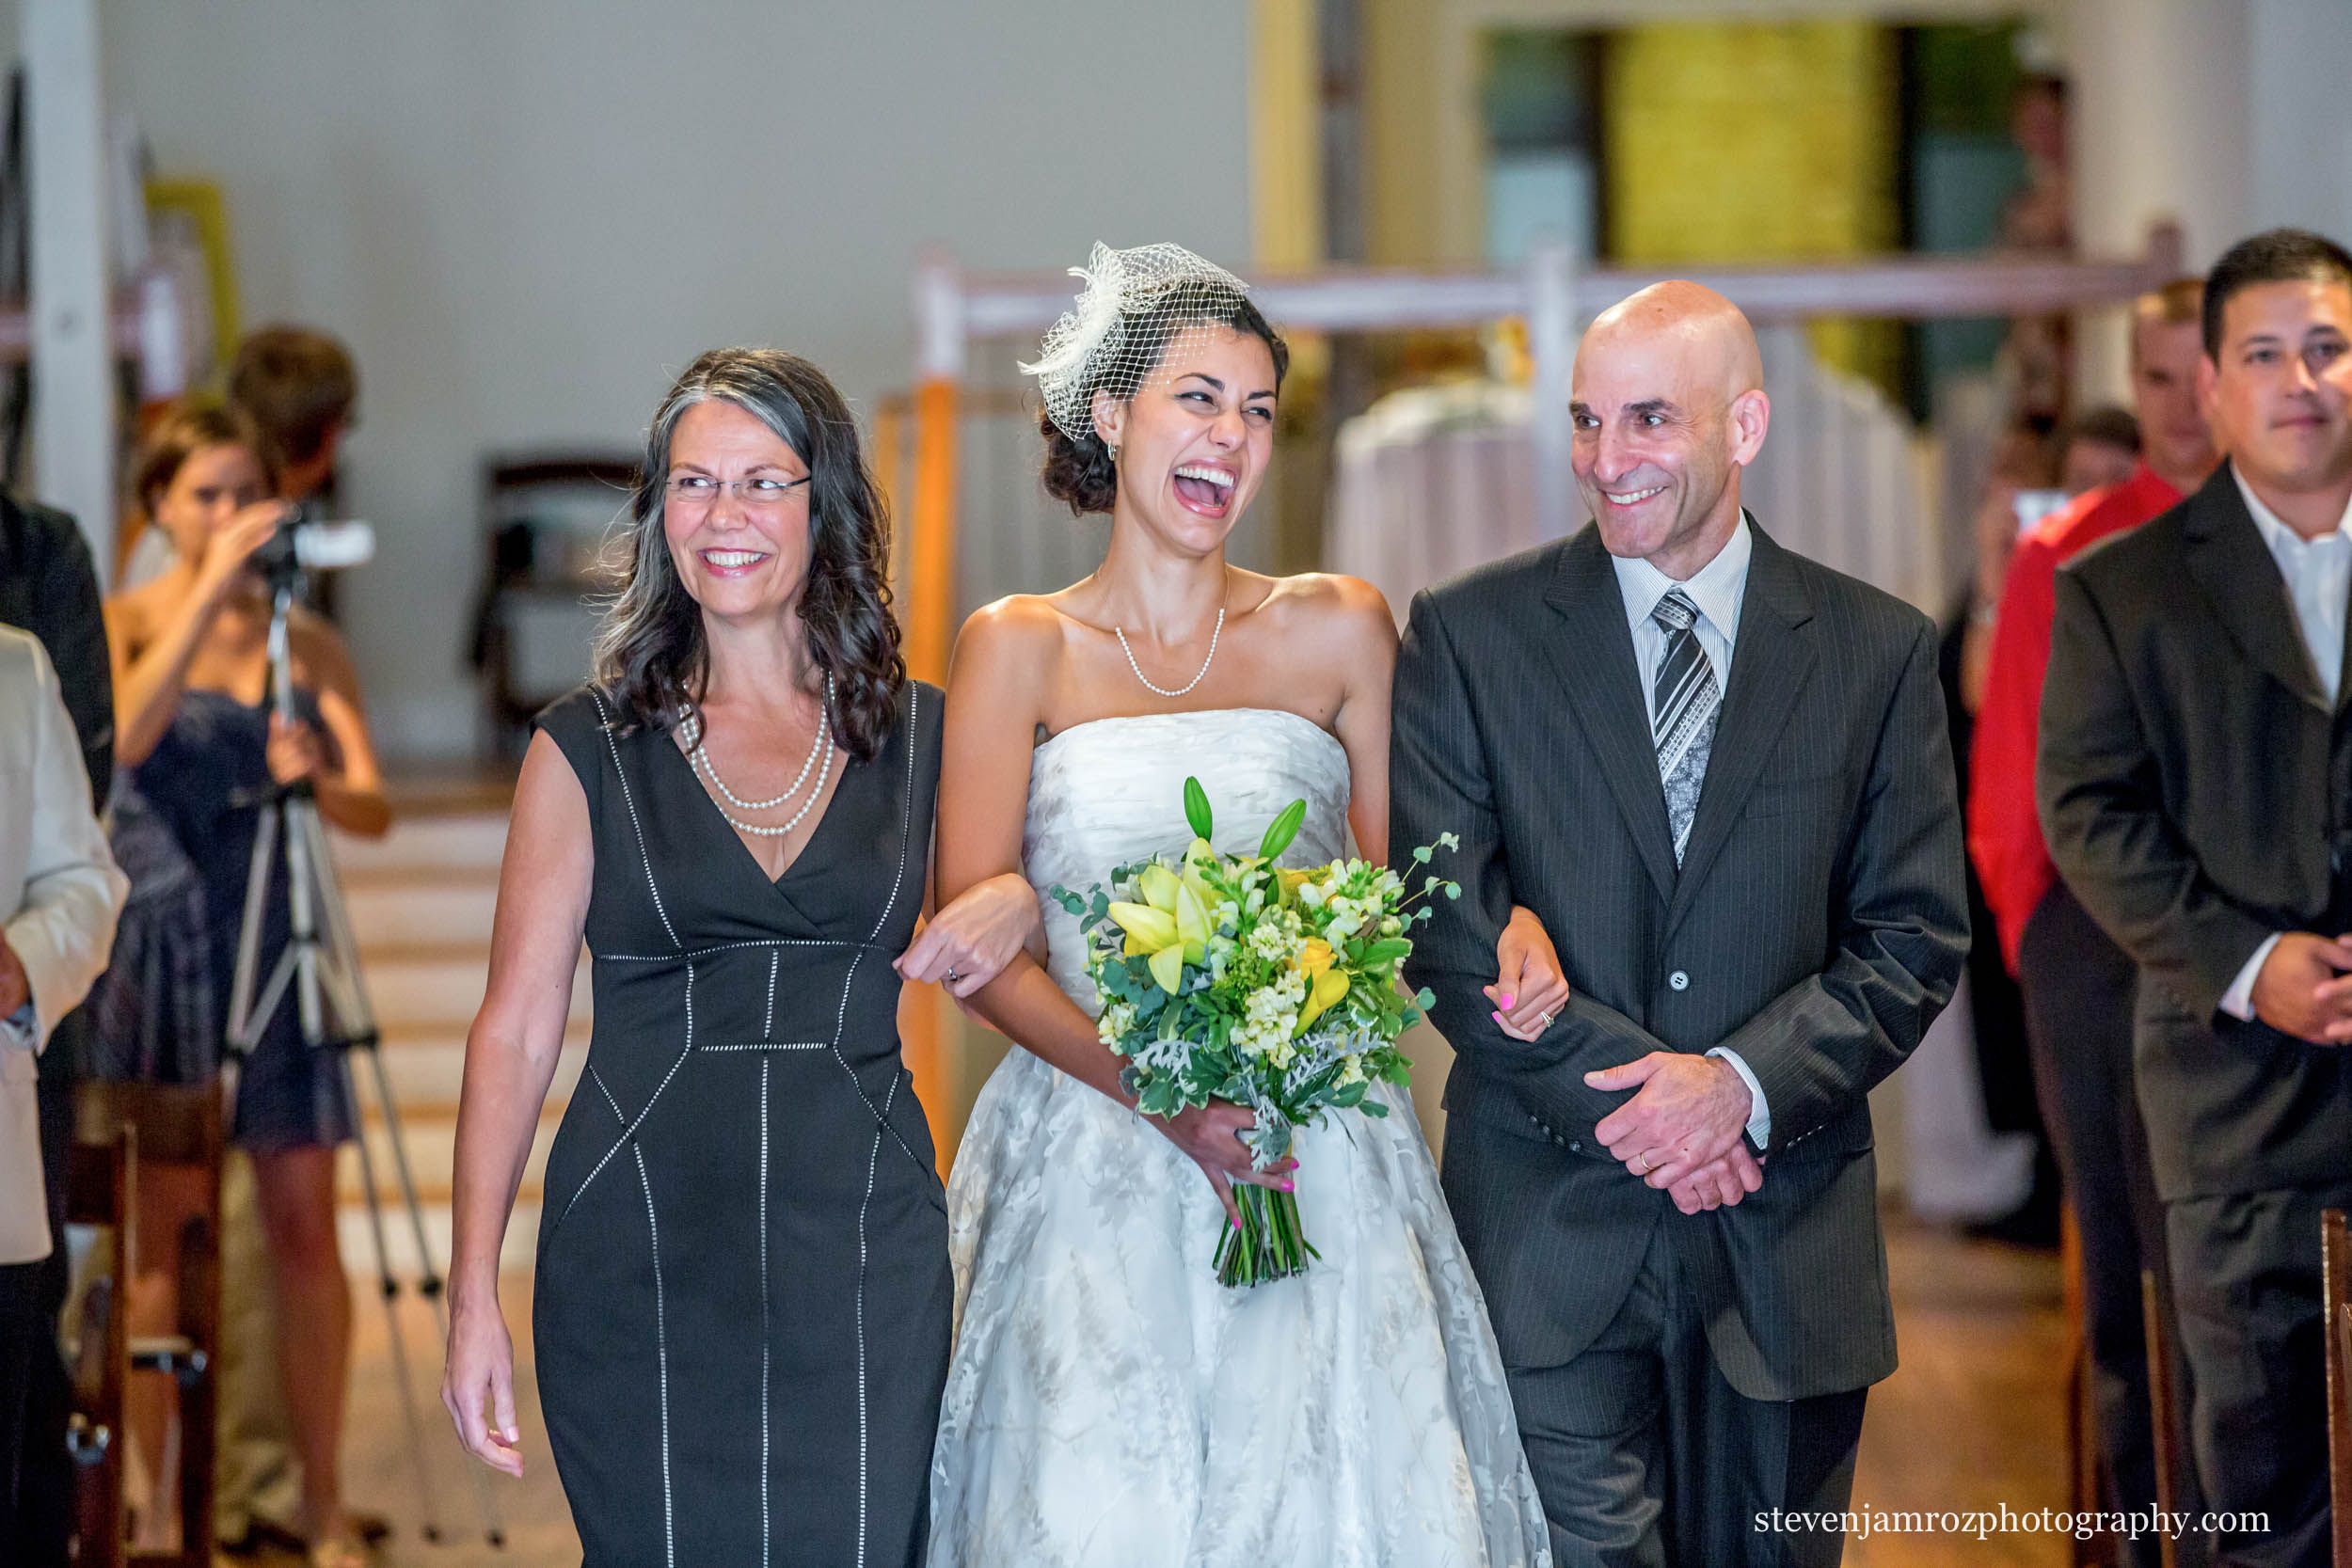 230-stockroom-wedding-walking-down-aisle-steven-jamroz-photography-0012.jpg